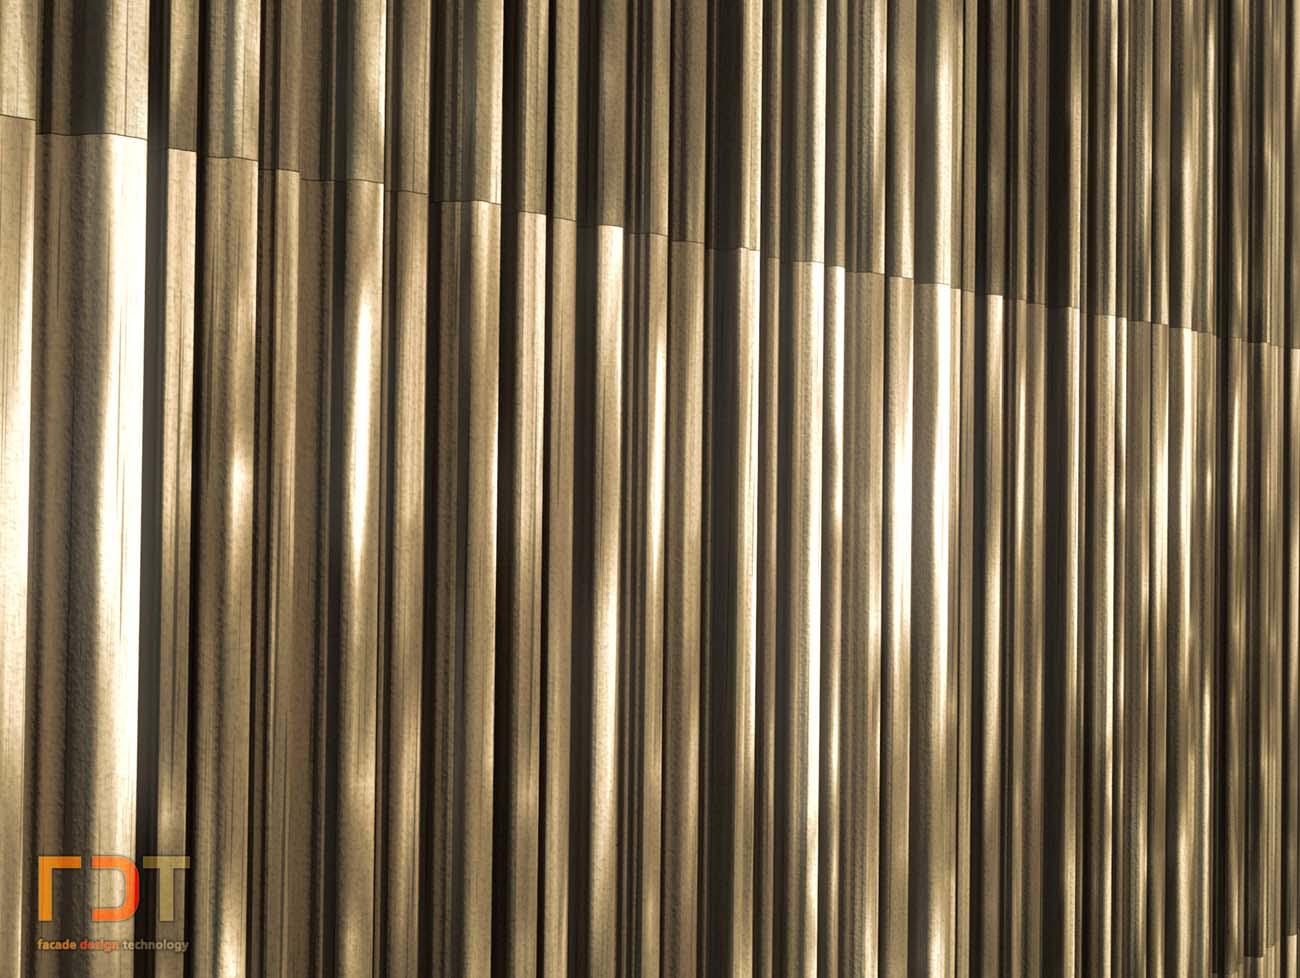 FDT Keramik Fassade Visualisierung